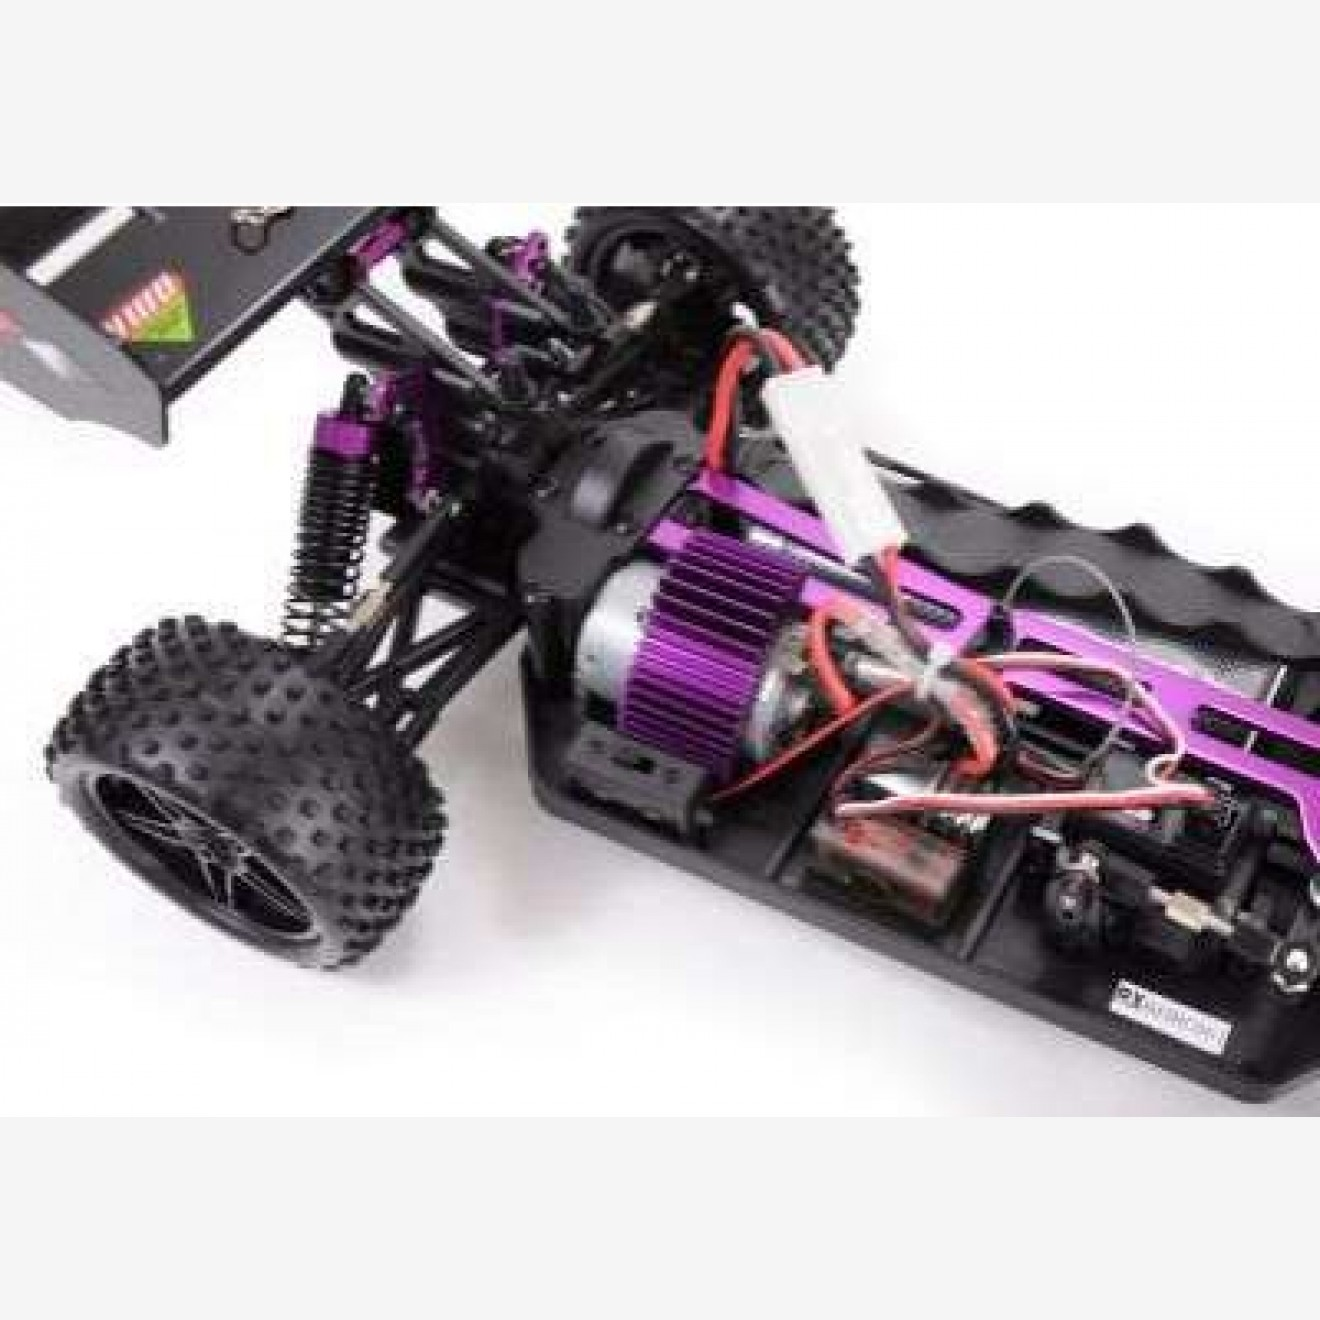 schnelle ferngesteuerte buggies monstertrucks rc buggy. Black Bedroom Furniture Sets. Home Design Ideas